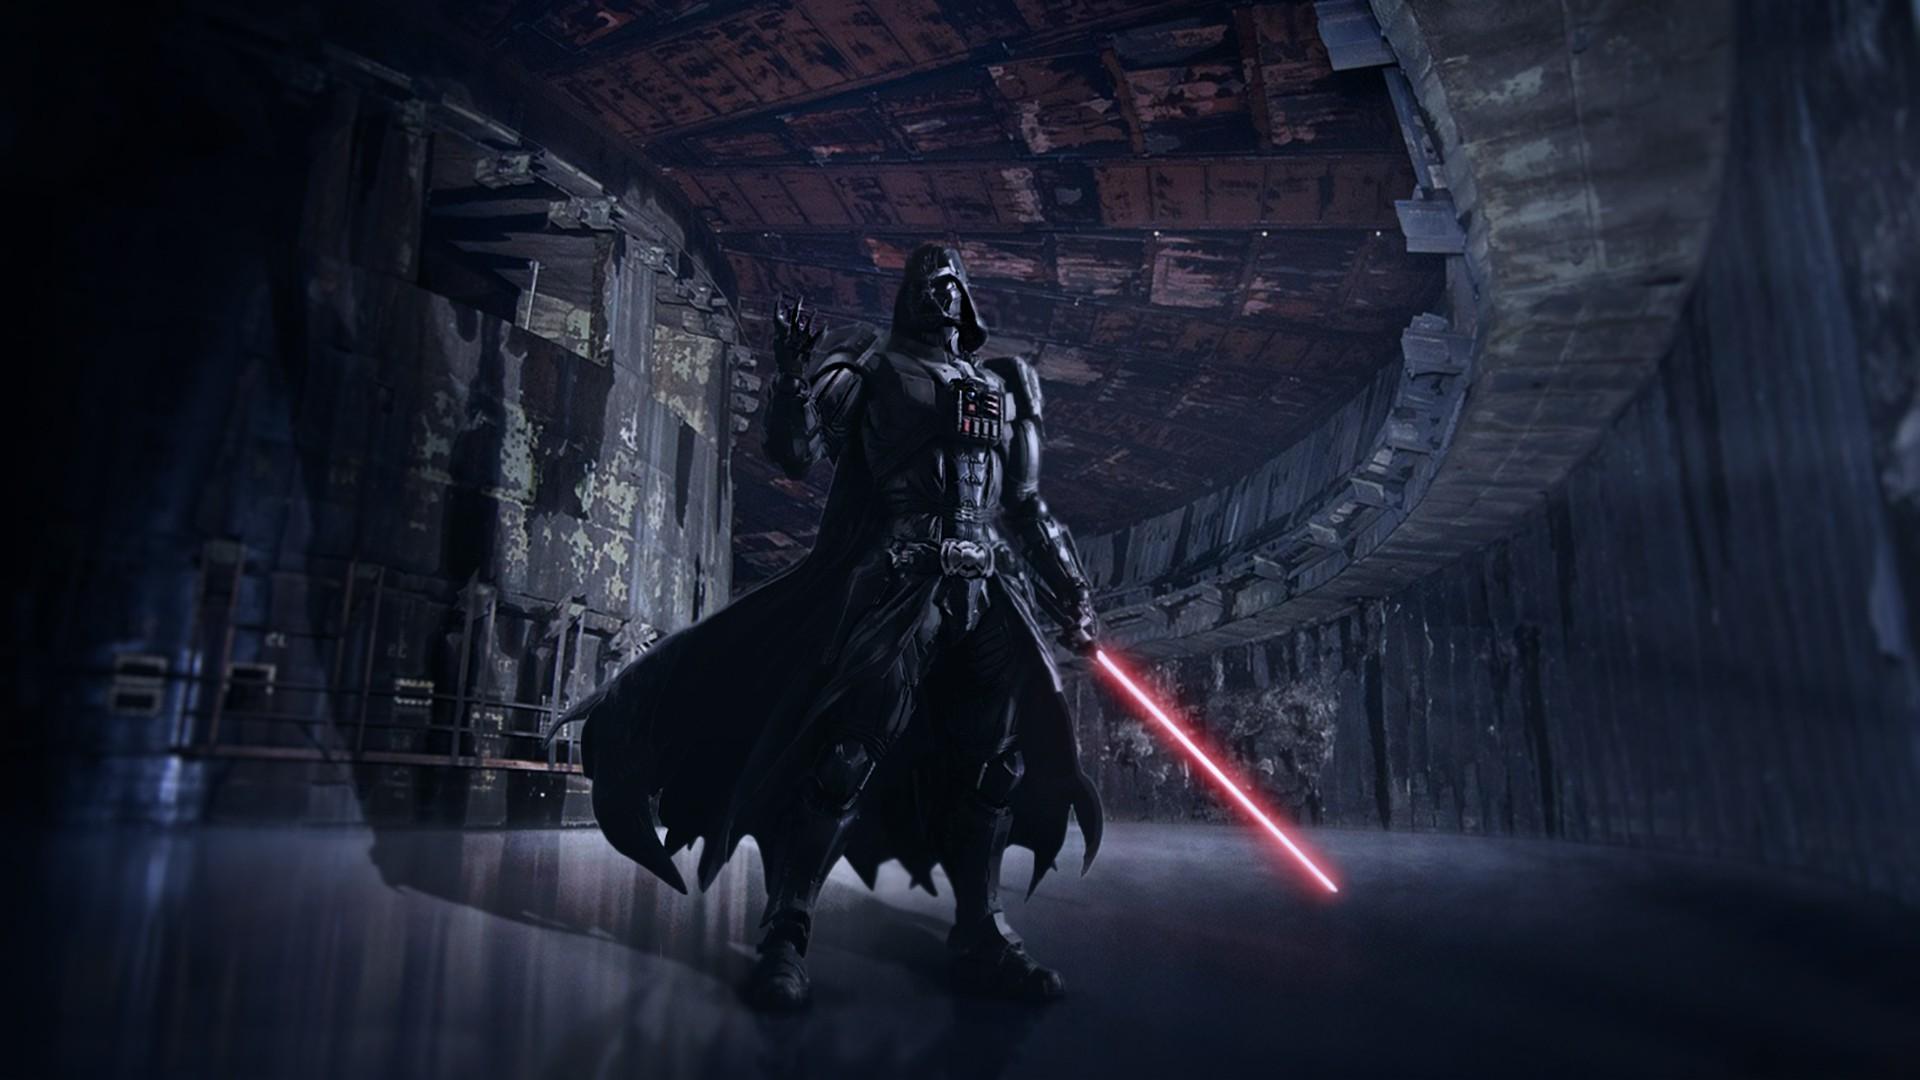 Darth Vader Wallpaper Iphone: Force Awakens X Wing Wallpaper (69+ Images